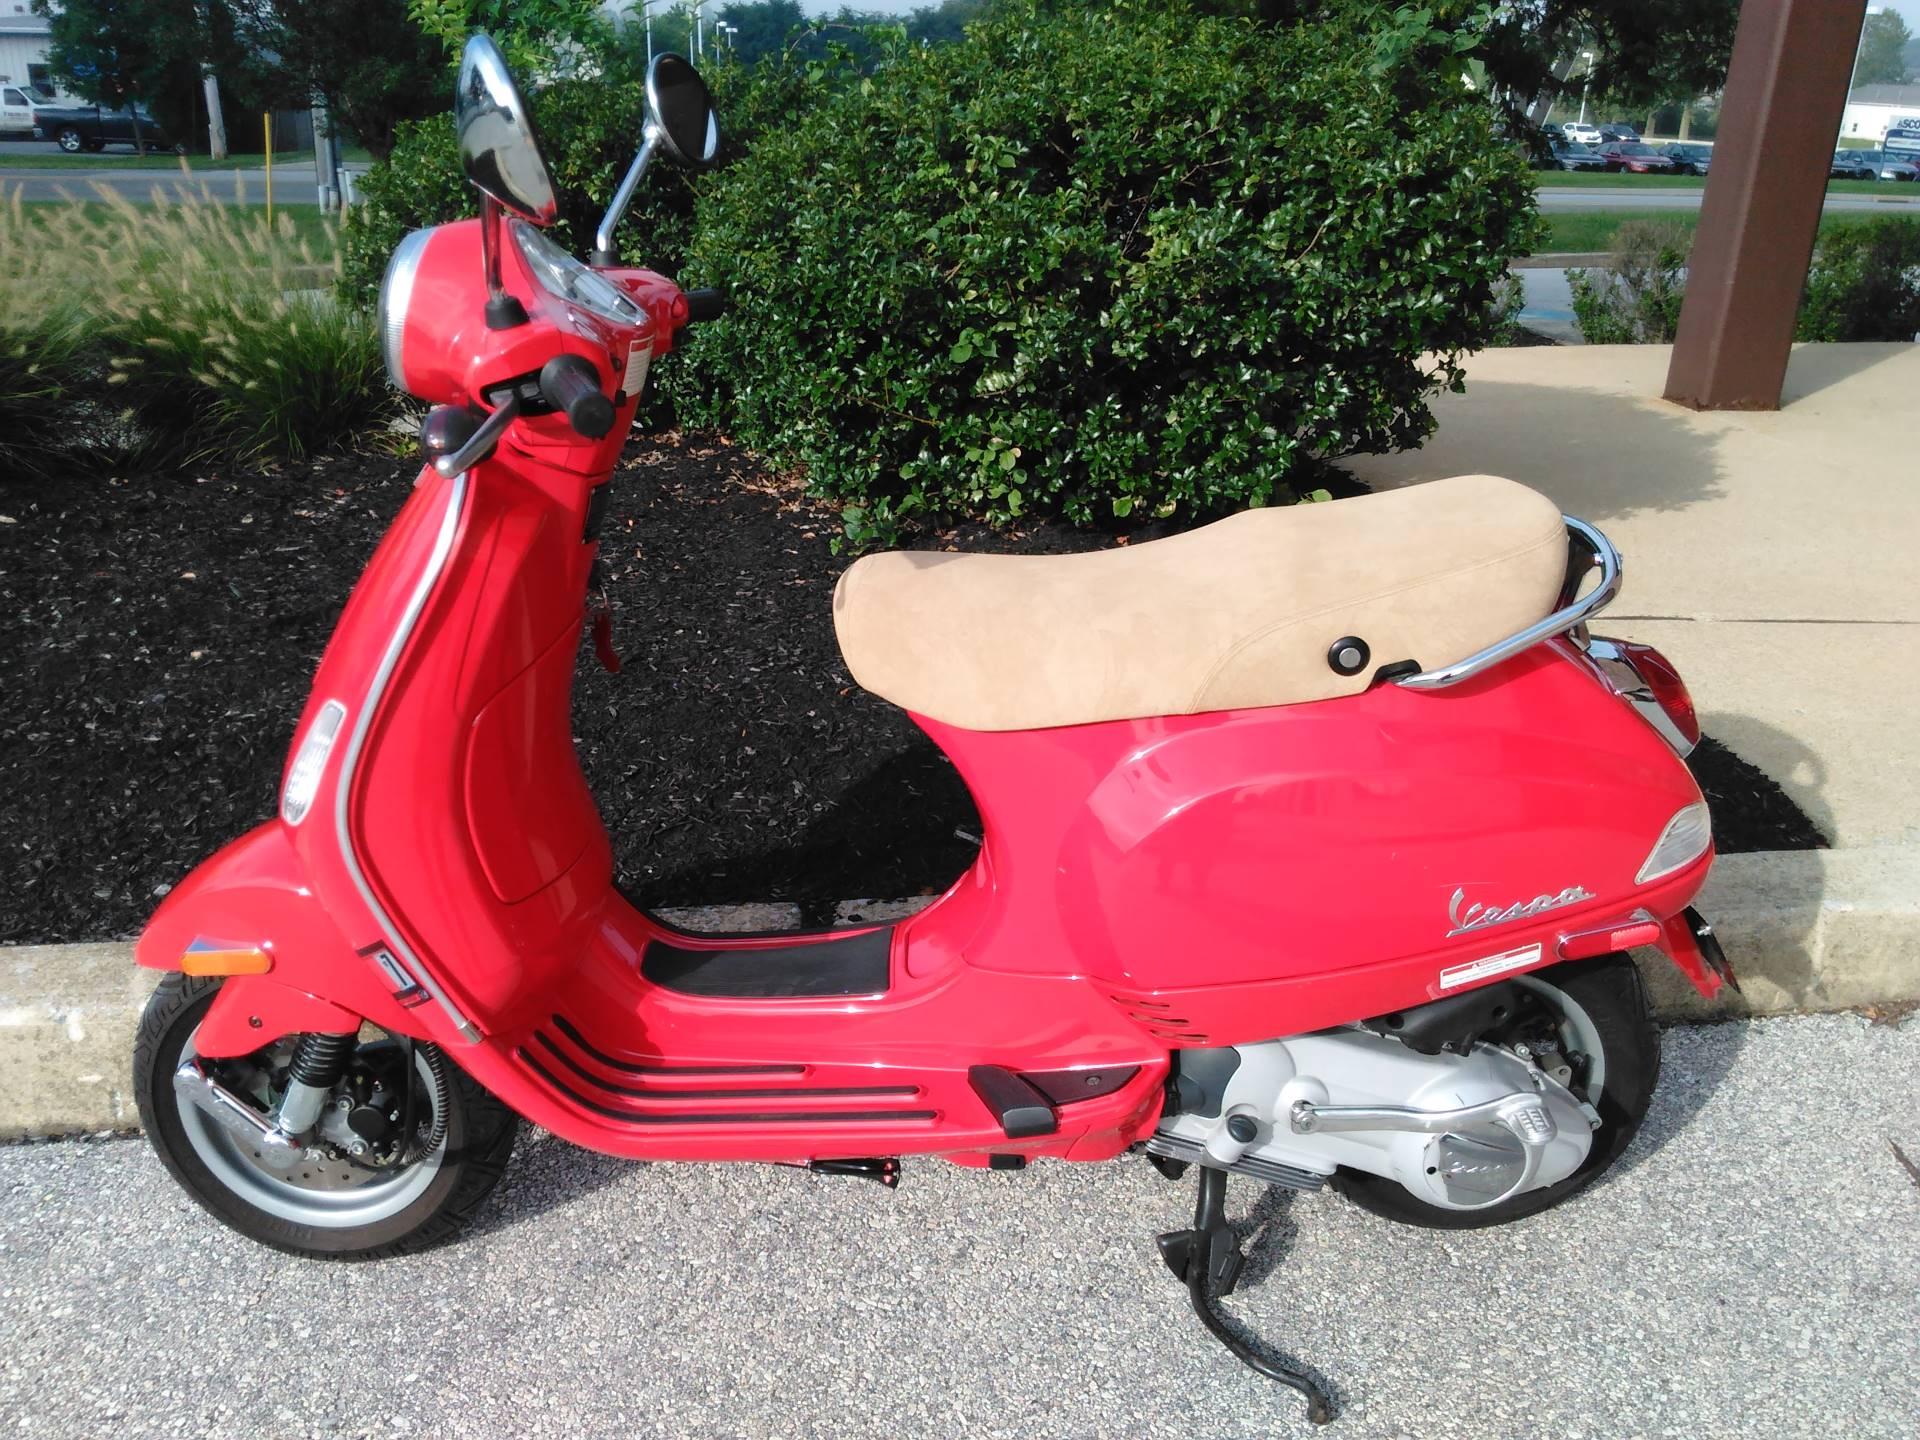 2006 Vespa LX 150 4